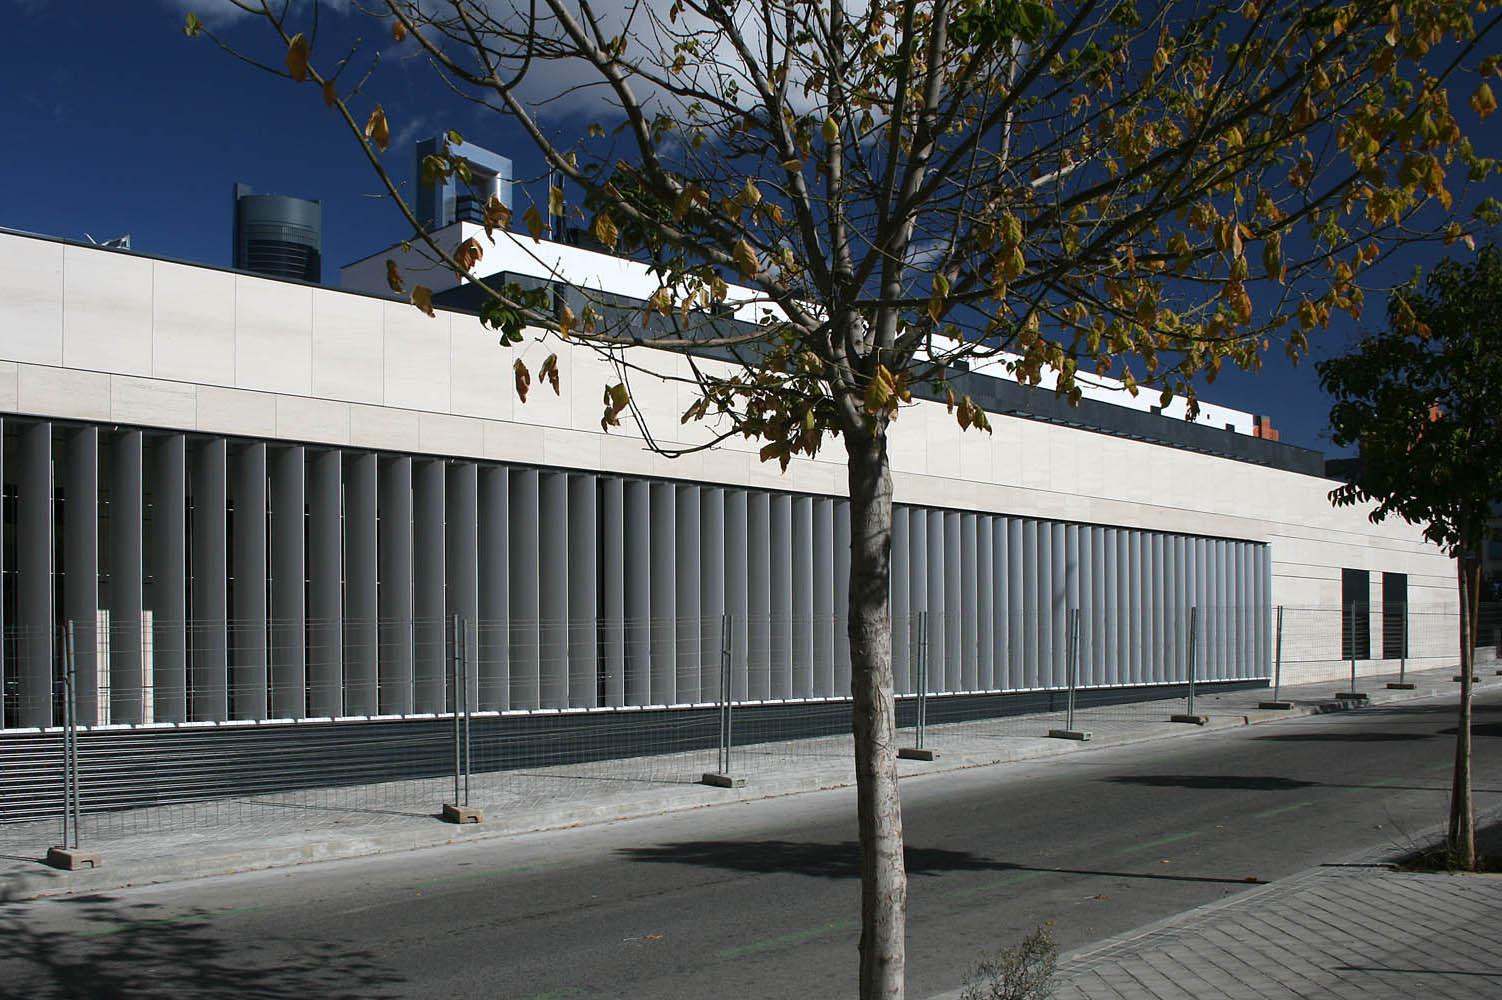 Residencia para mayores en madrid geed arquitectos plataforma arquitectura - Arquitectos interioristas madrid ...